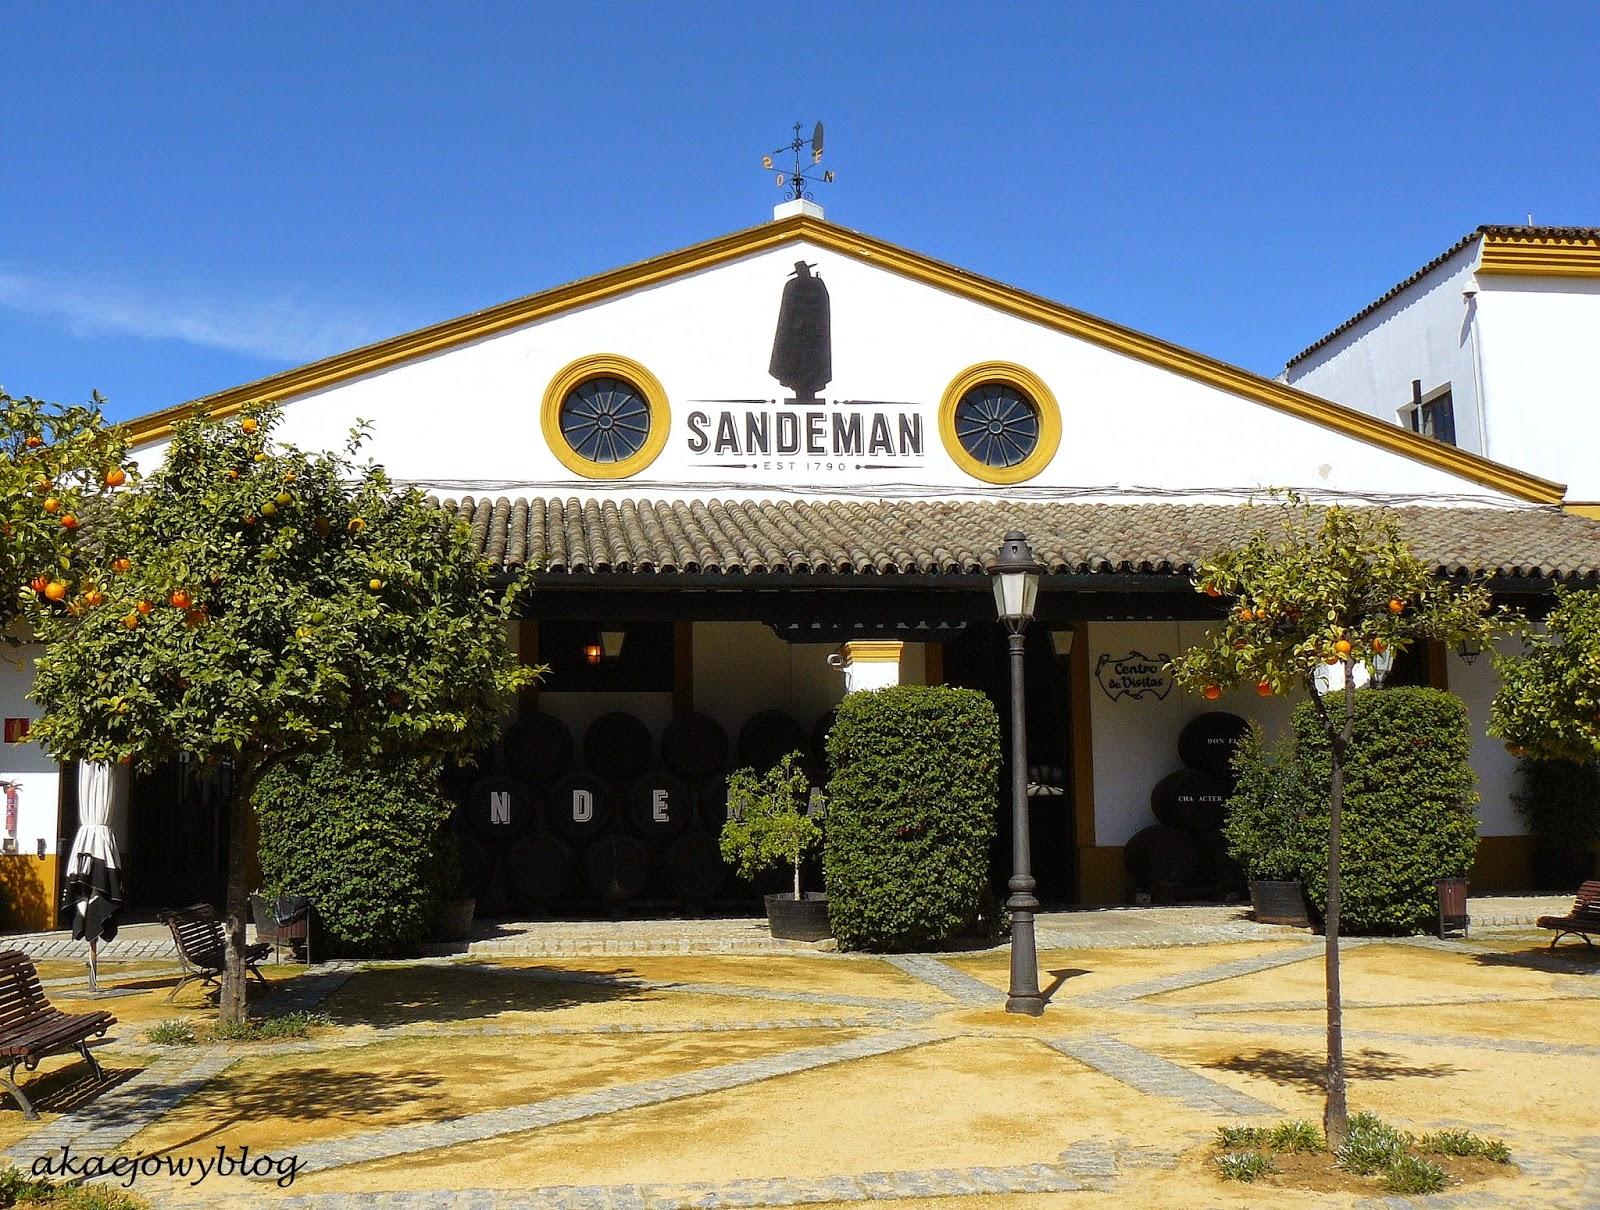 Andaluzja - produkcja sherry.